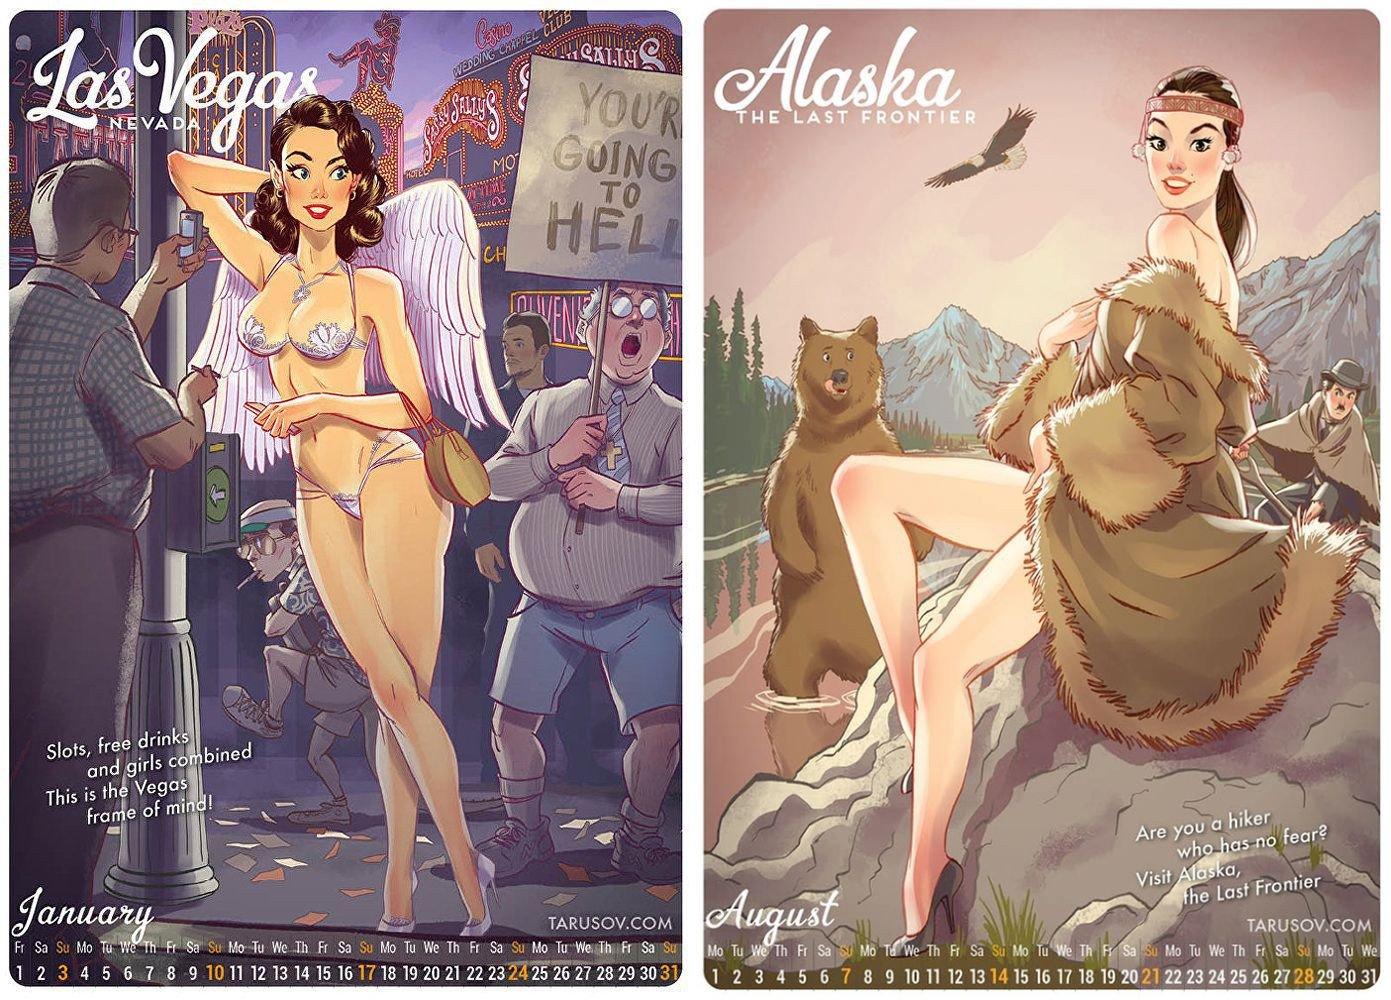 Пин-ап календарь на 2016 год от Андрея Тарусова